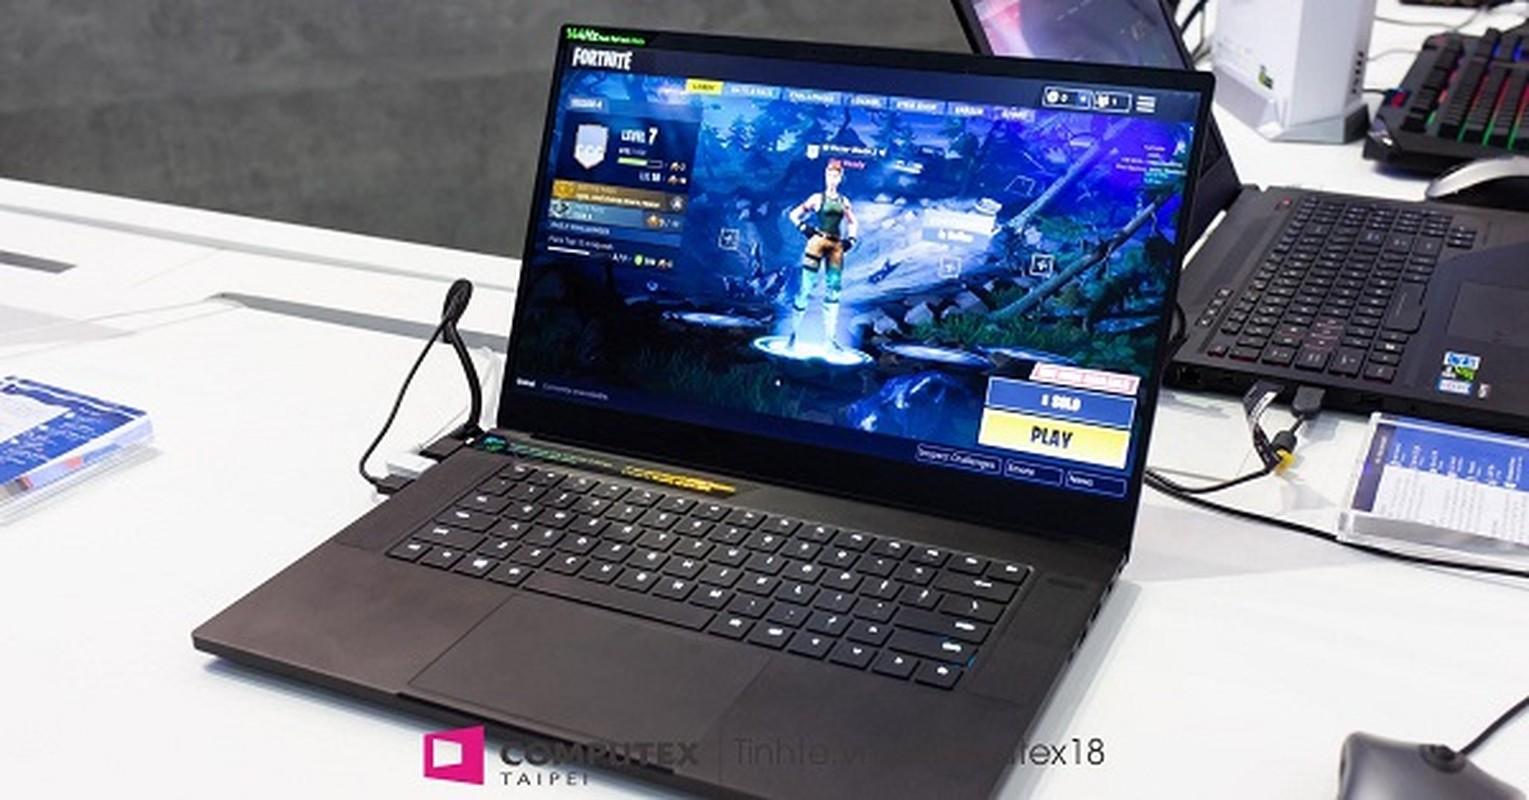 6 dong laptop dinh nhat nam 2020 cho cac game thu-Hinh-9